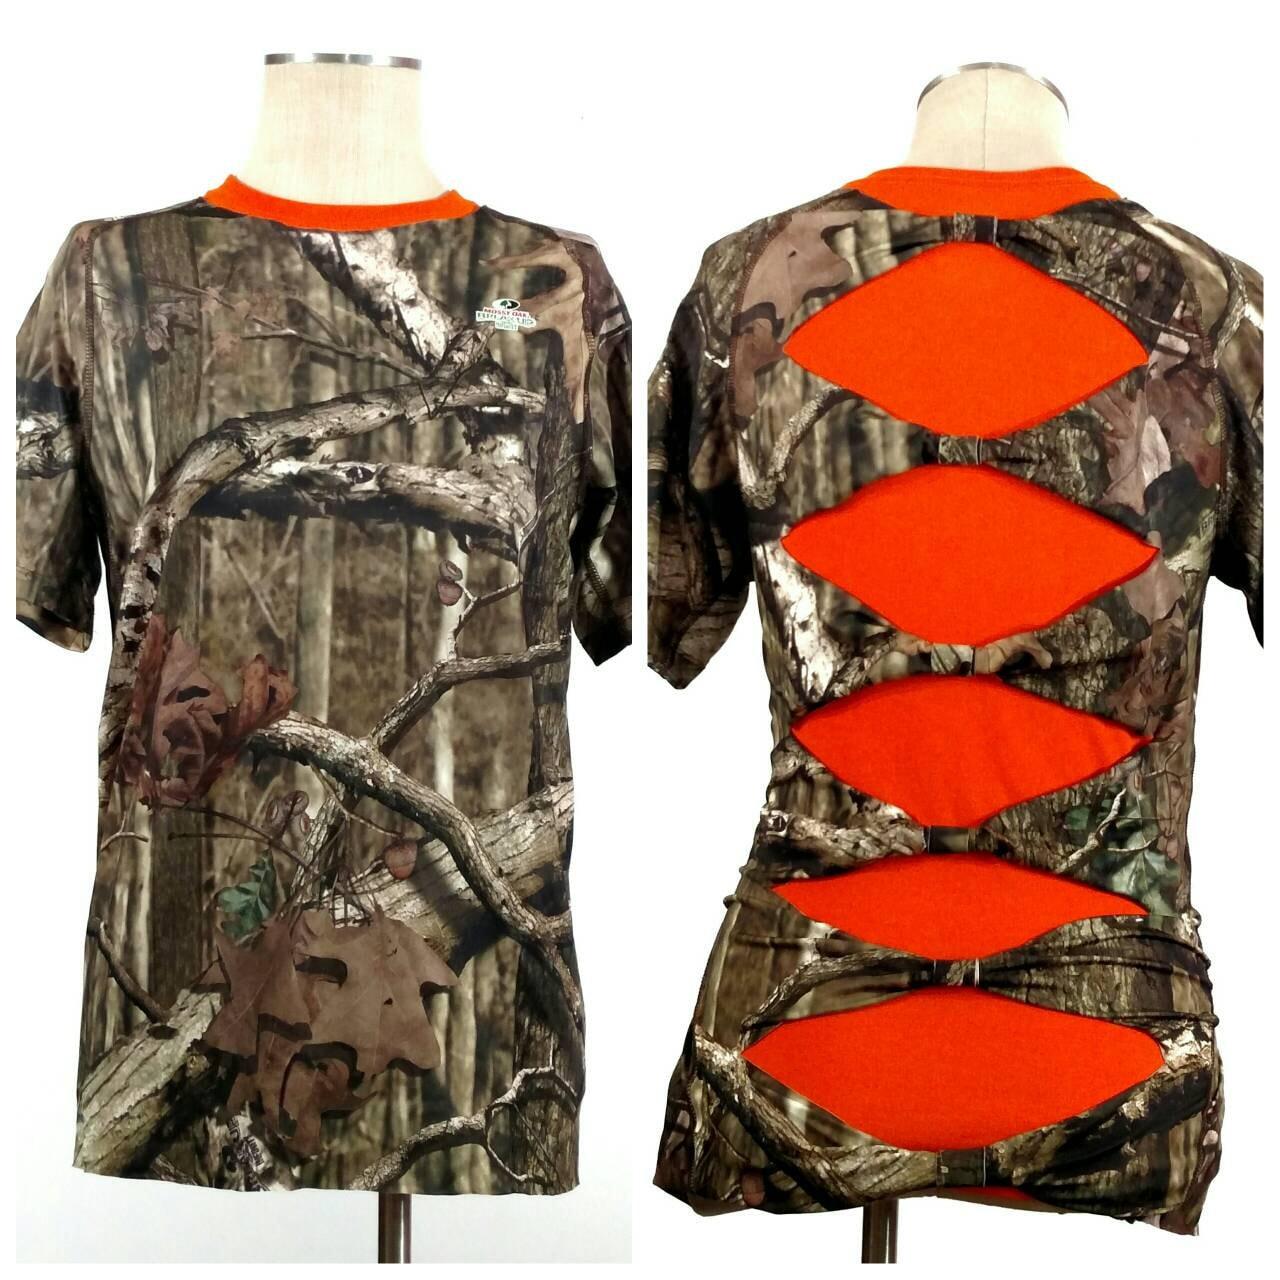 Realtree Camo Shirt Shredded Shirt Mossy Oak Camo Shirt